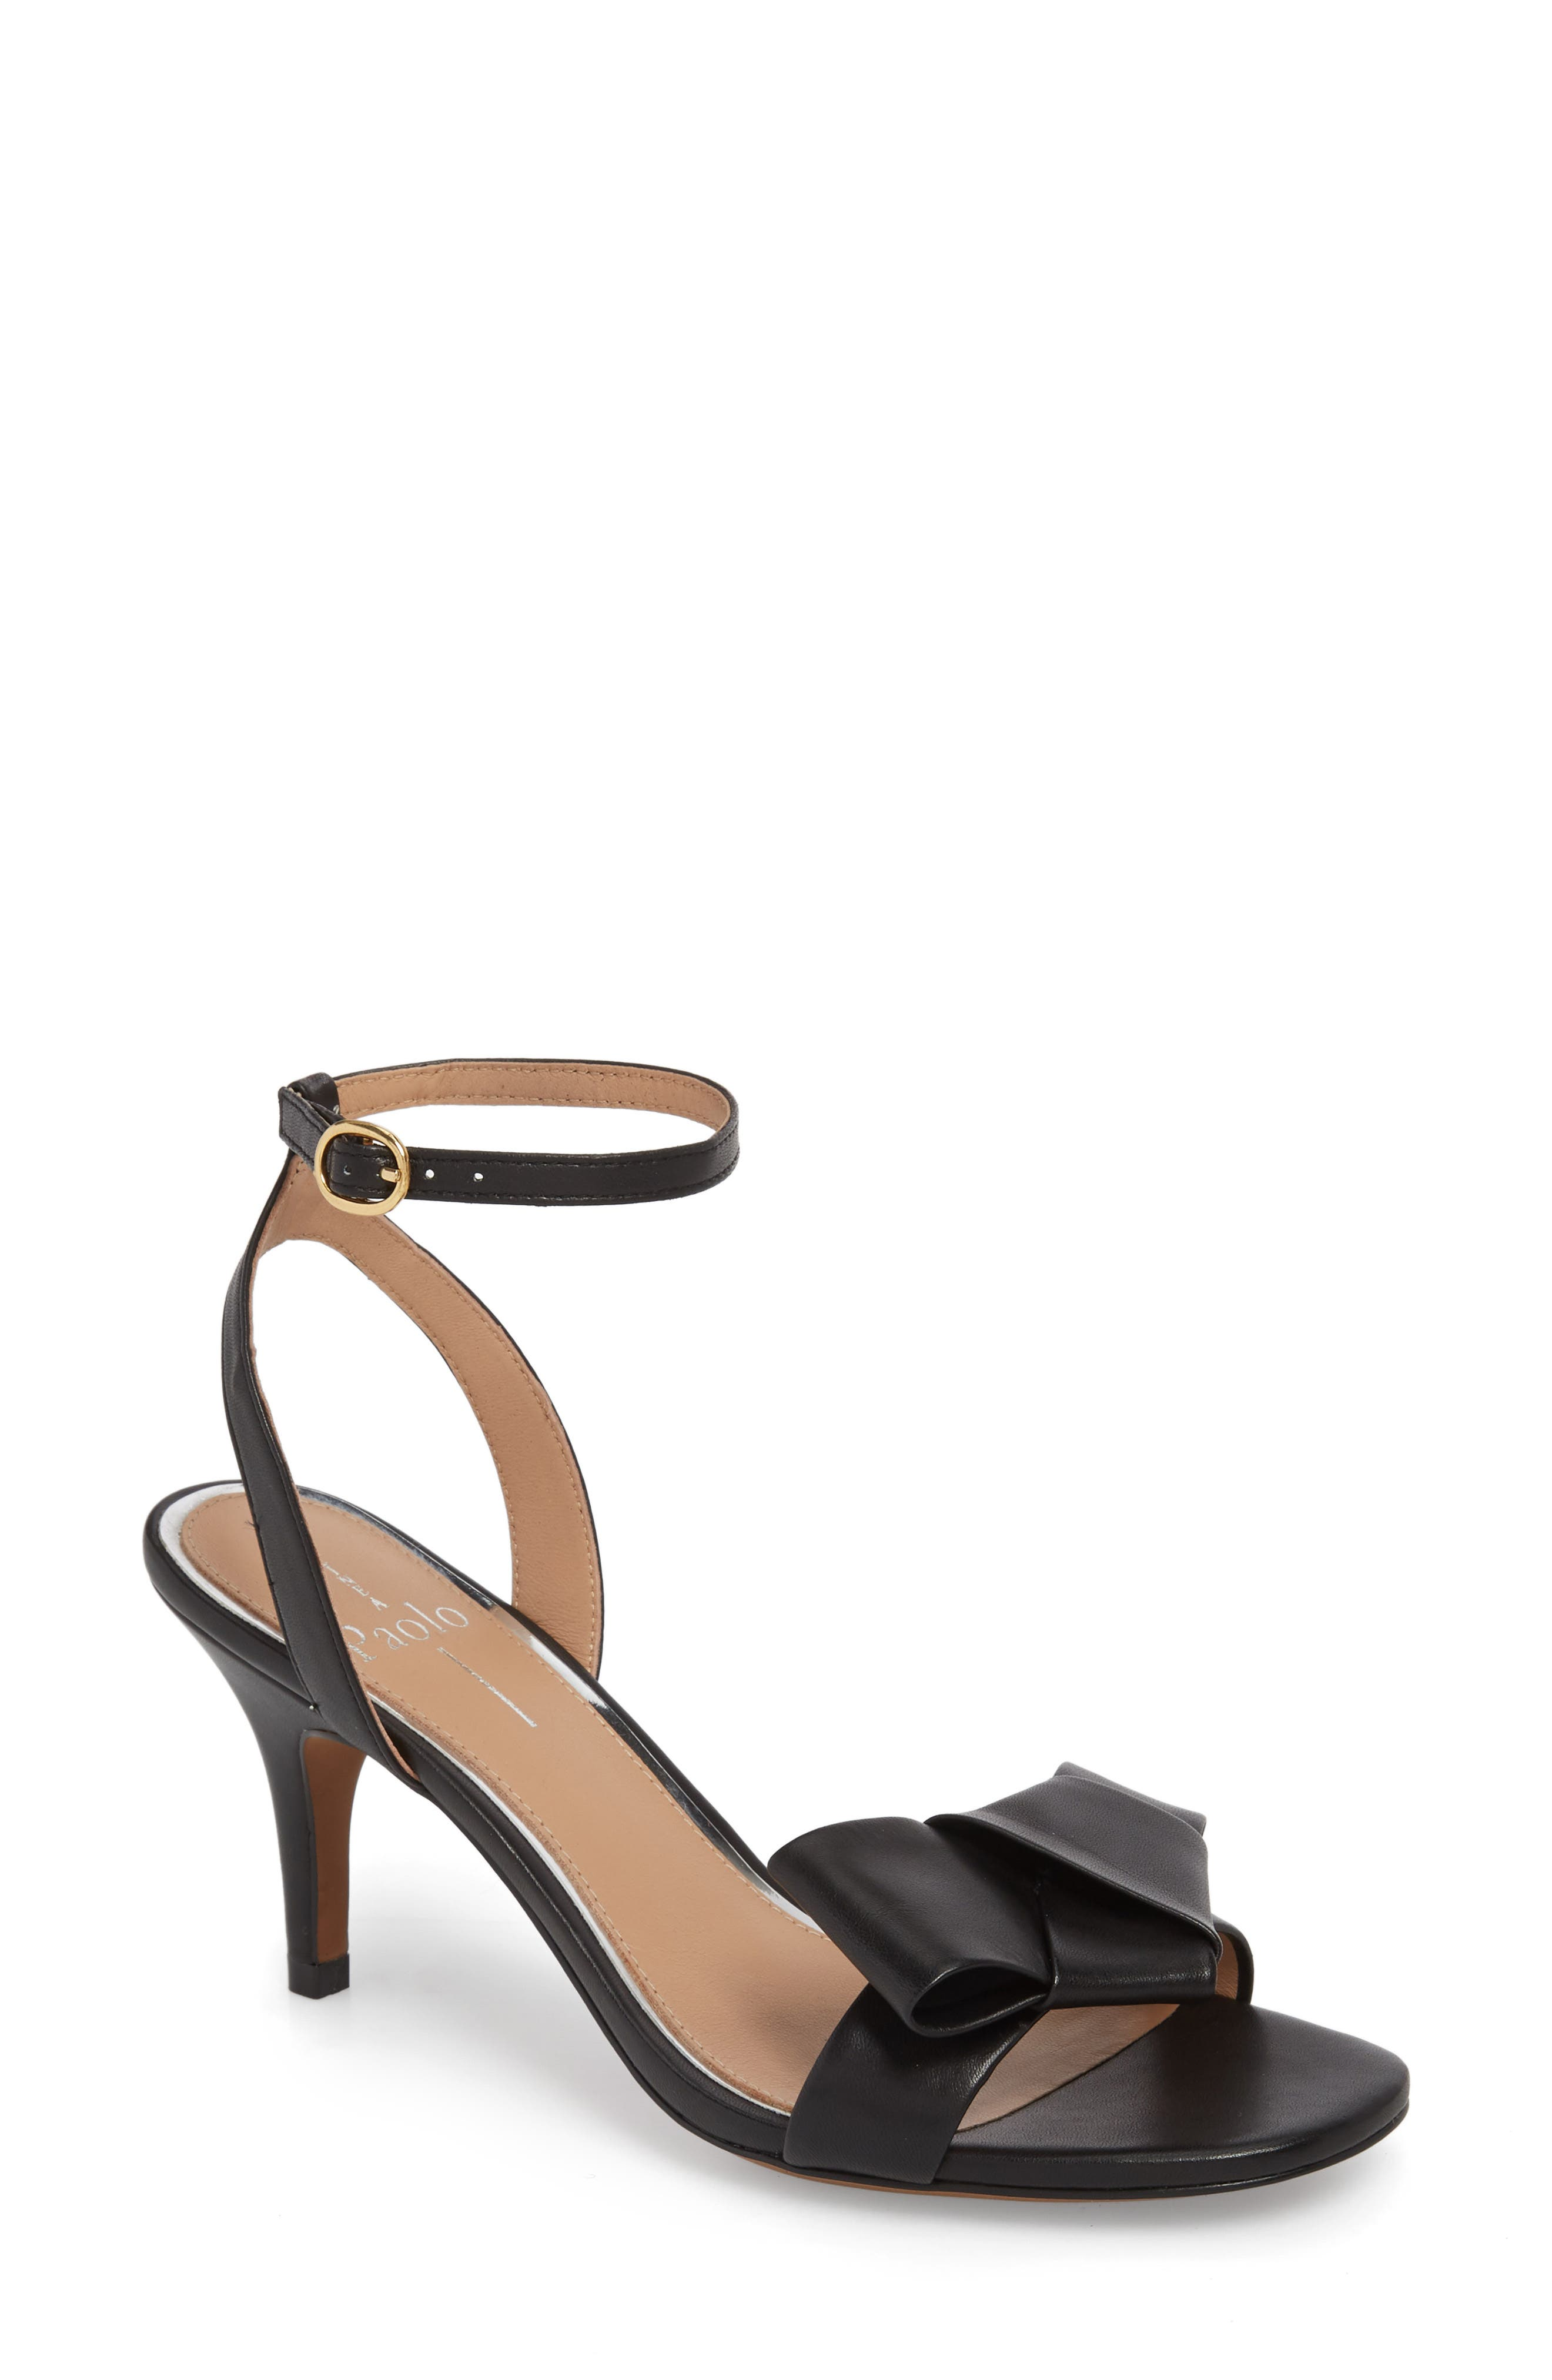 Haven Ankle Strap Sandal,                             Main thumbnail 1, color,                             BLACK LEATHER